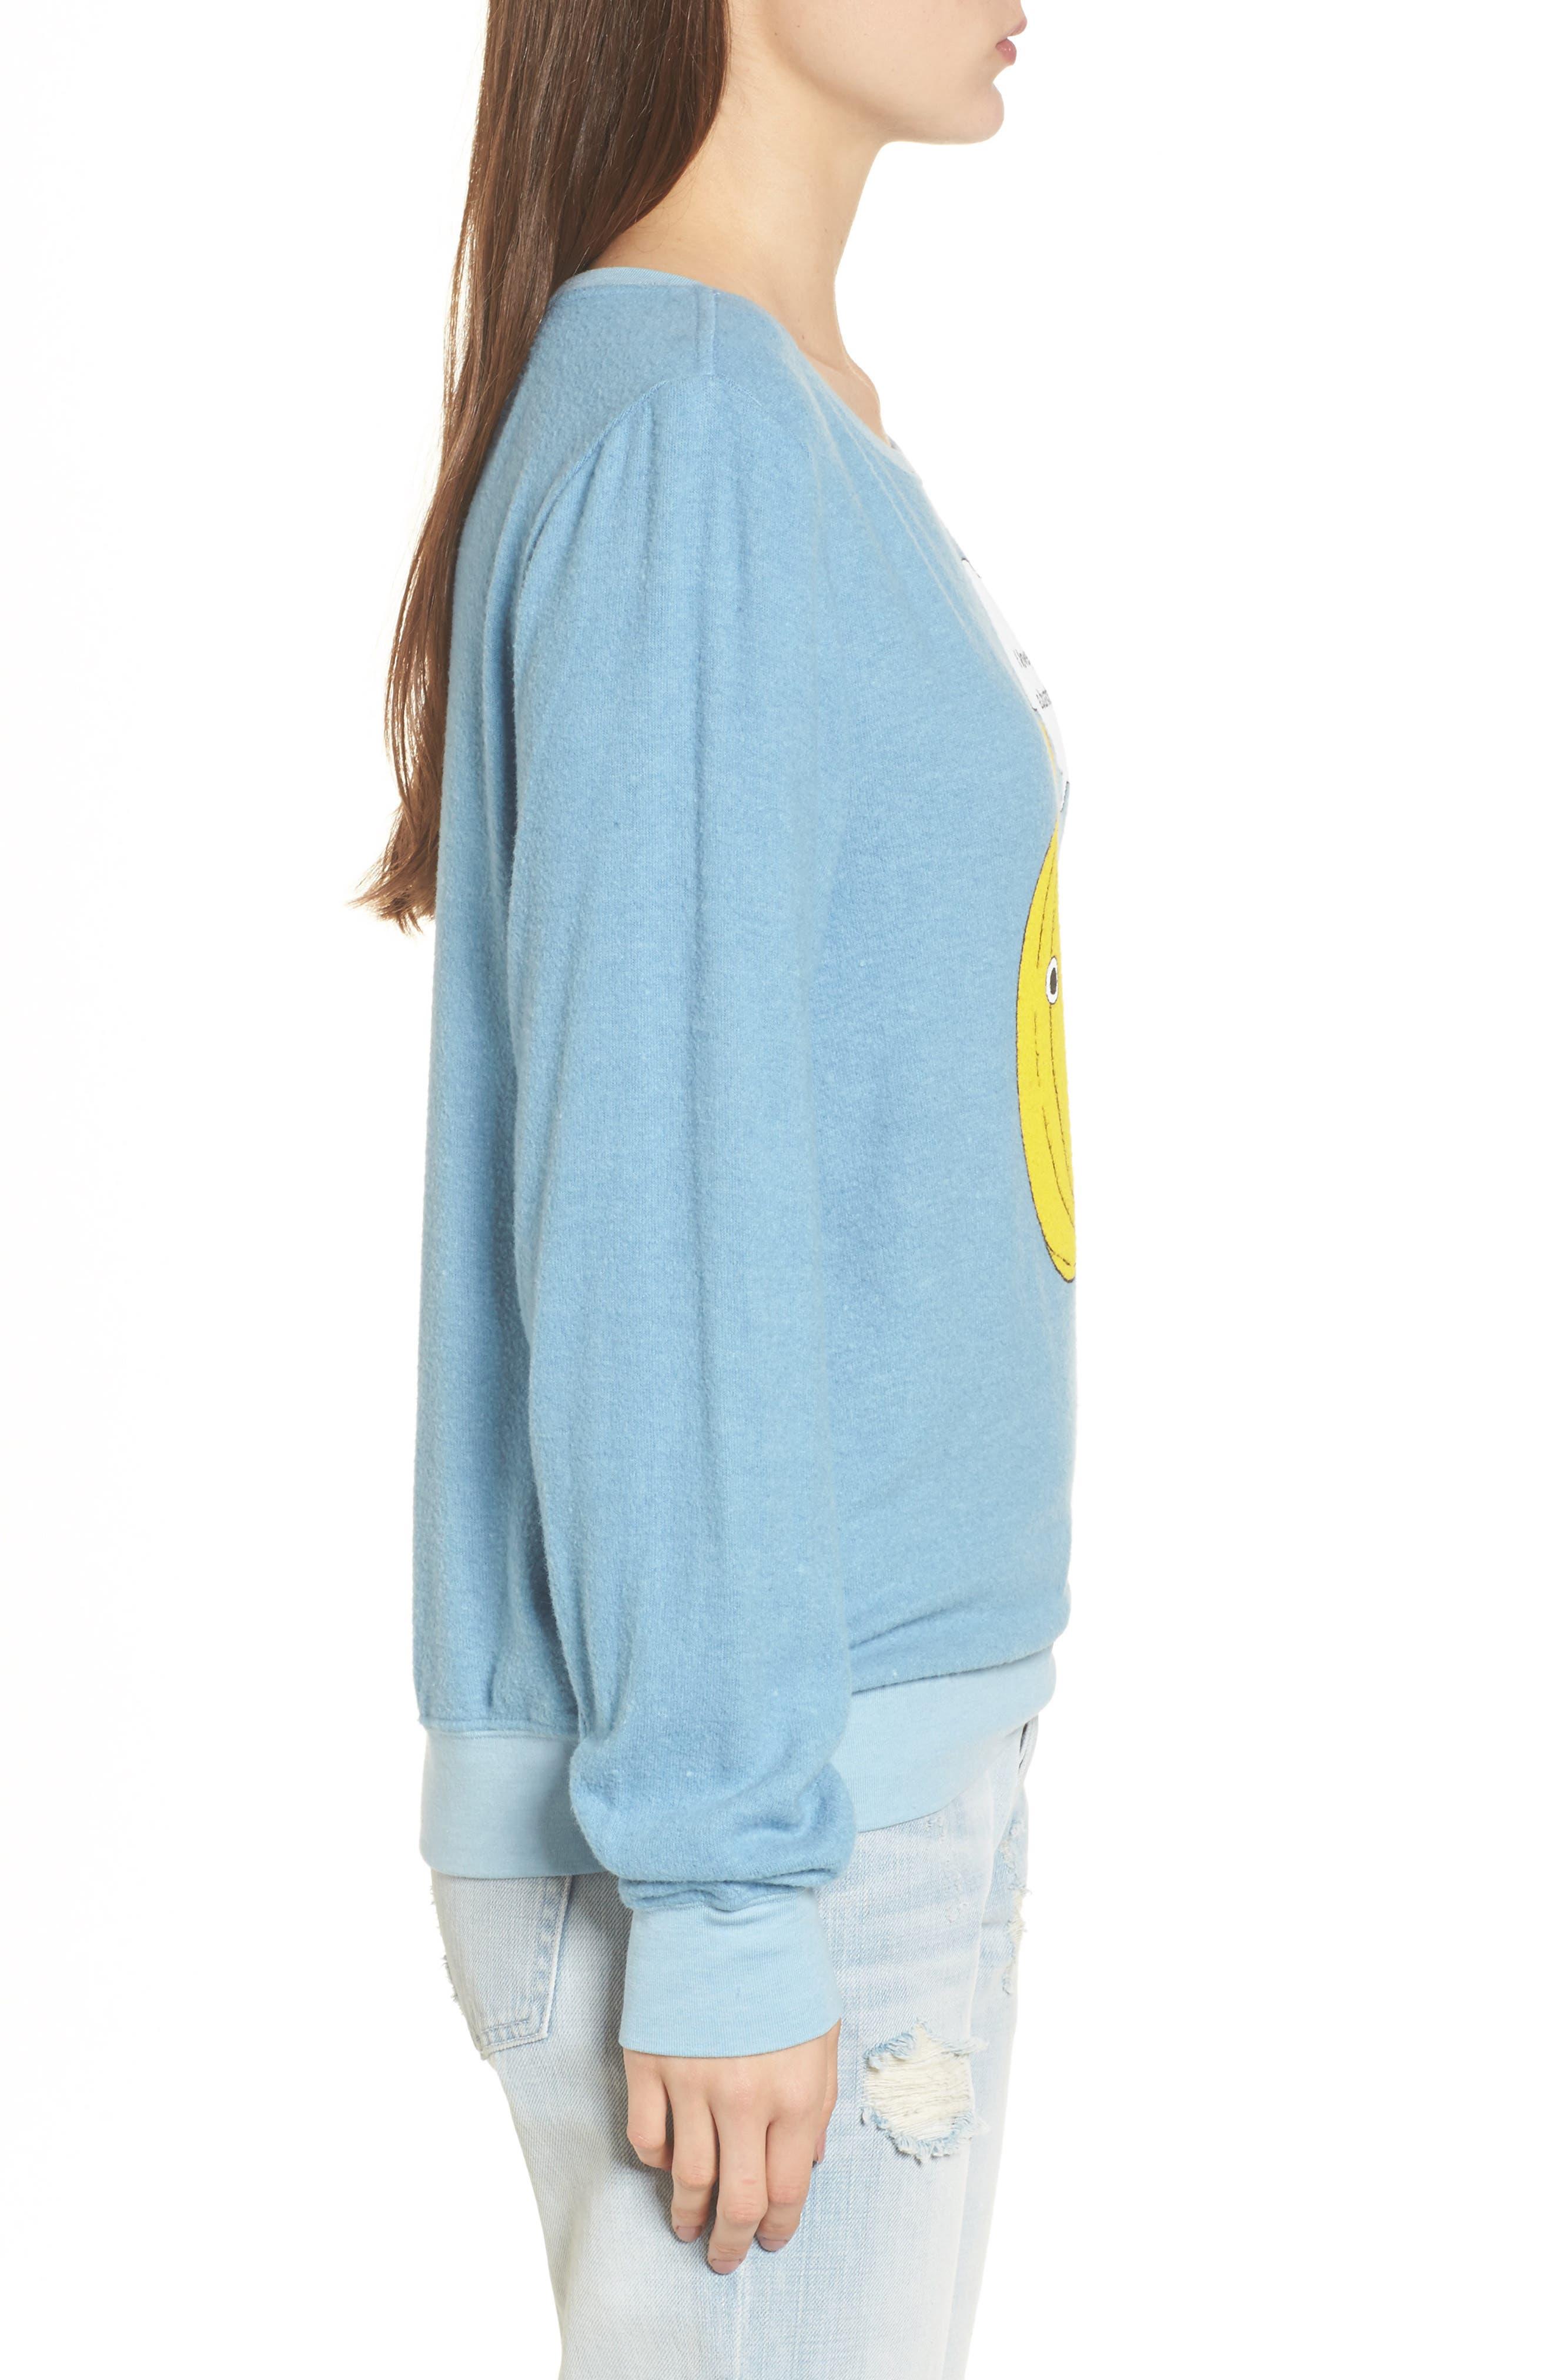 I Love You A Bunch Sweatshirt,                             Alternate thumbnail 3, color,                             420